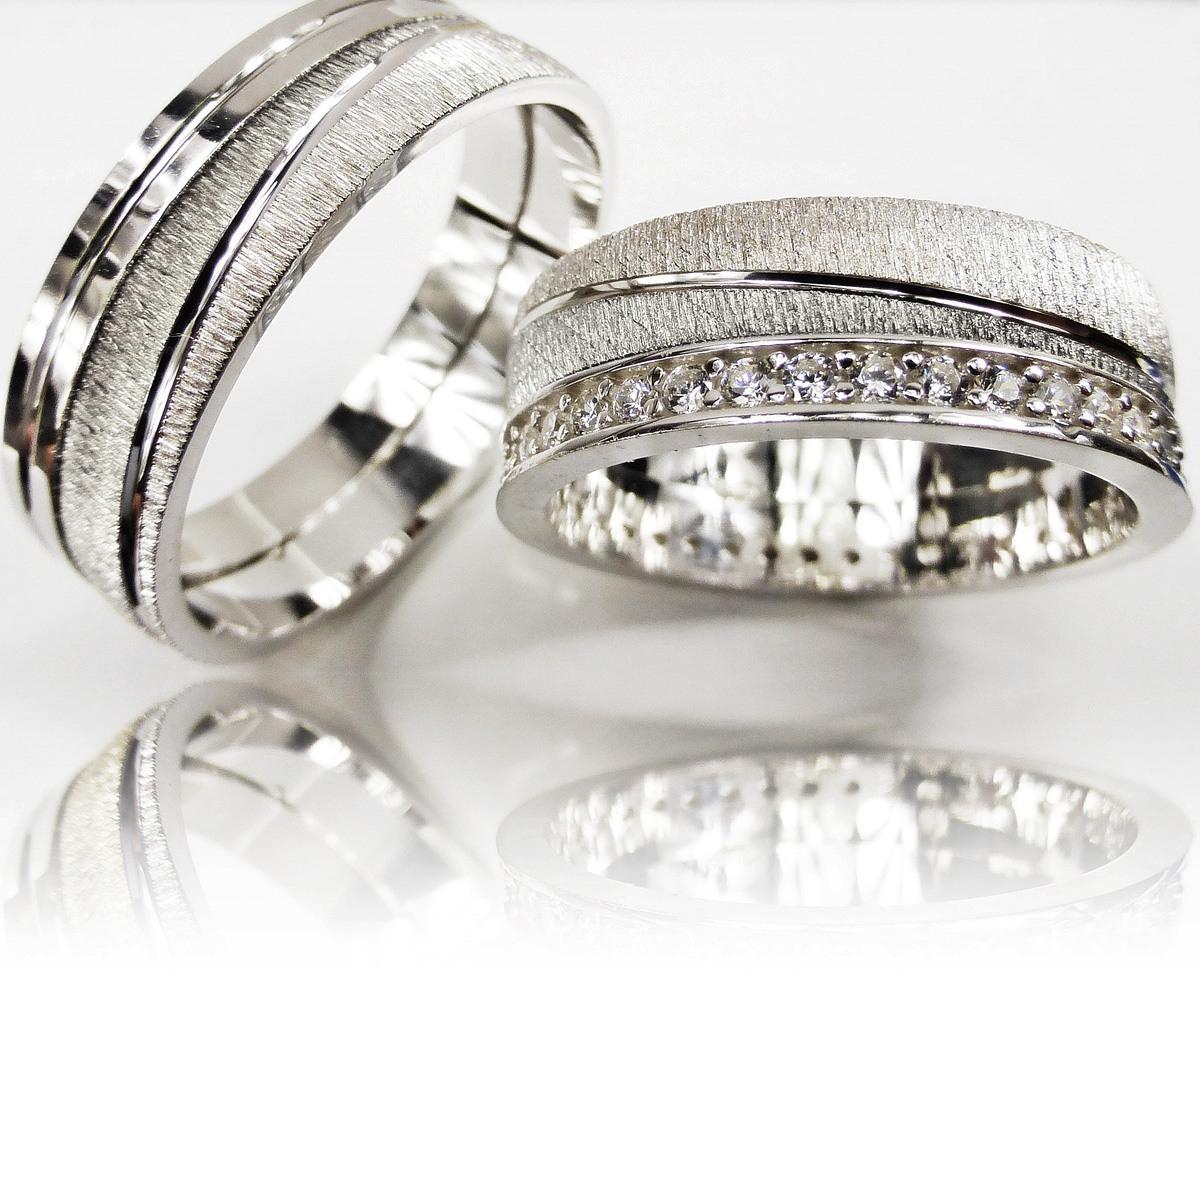 Details Zu 2 Trauringe 925 Silber Gravur Eheringe Verlobungsringe  Partnerringe 3311-S